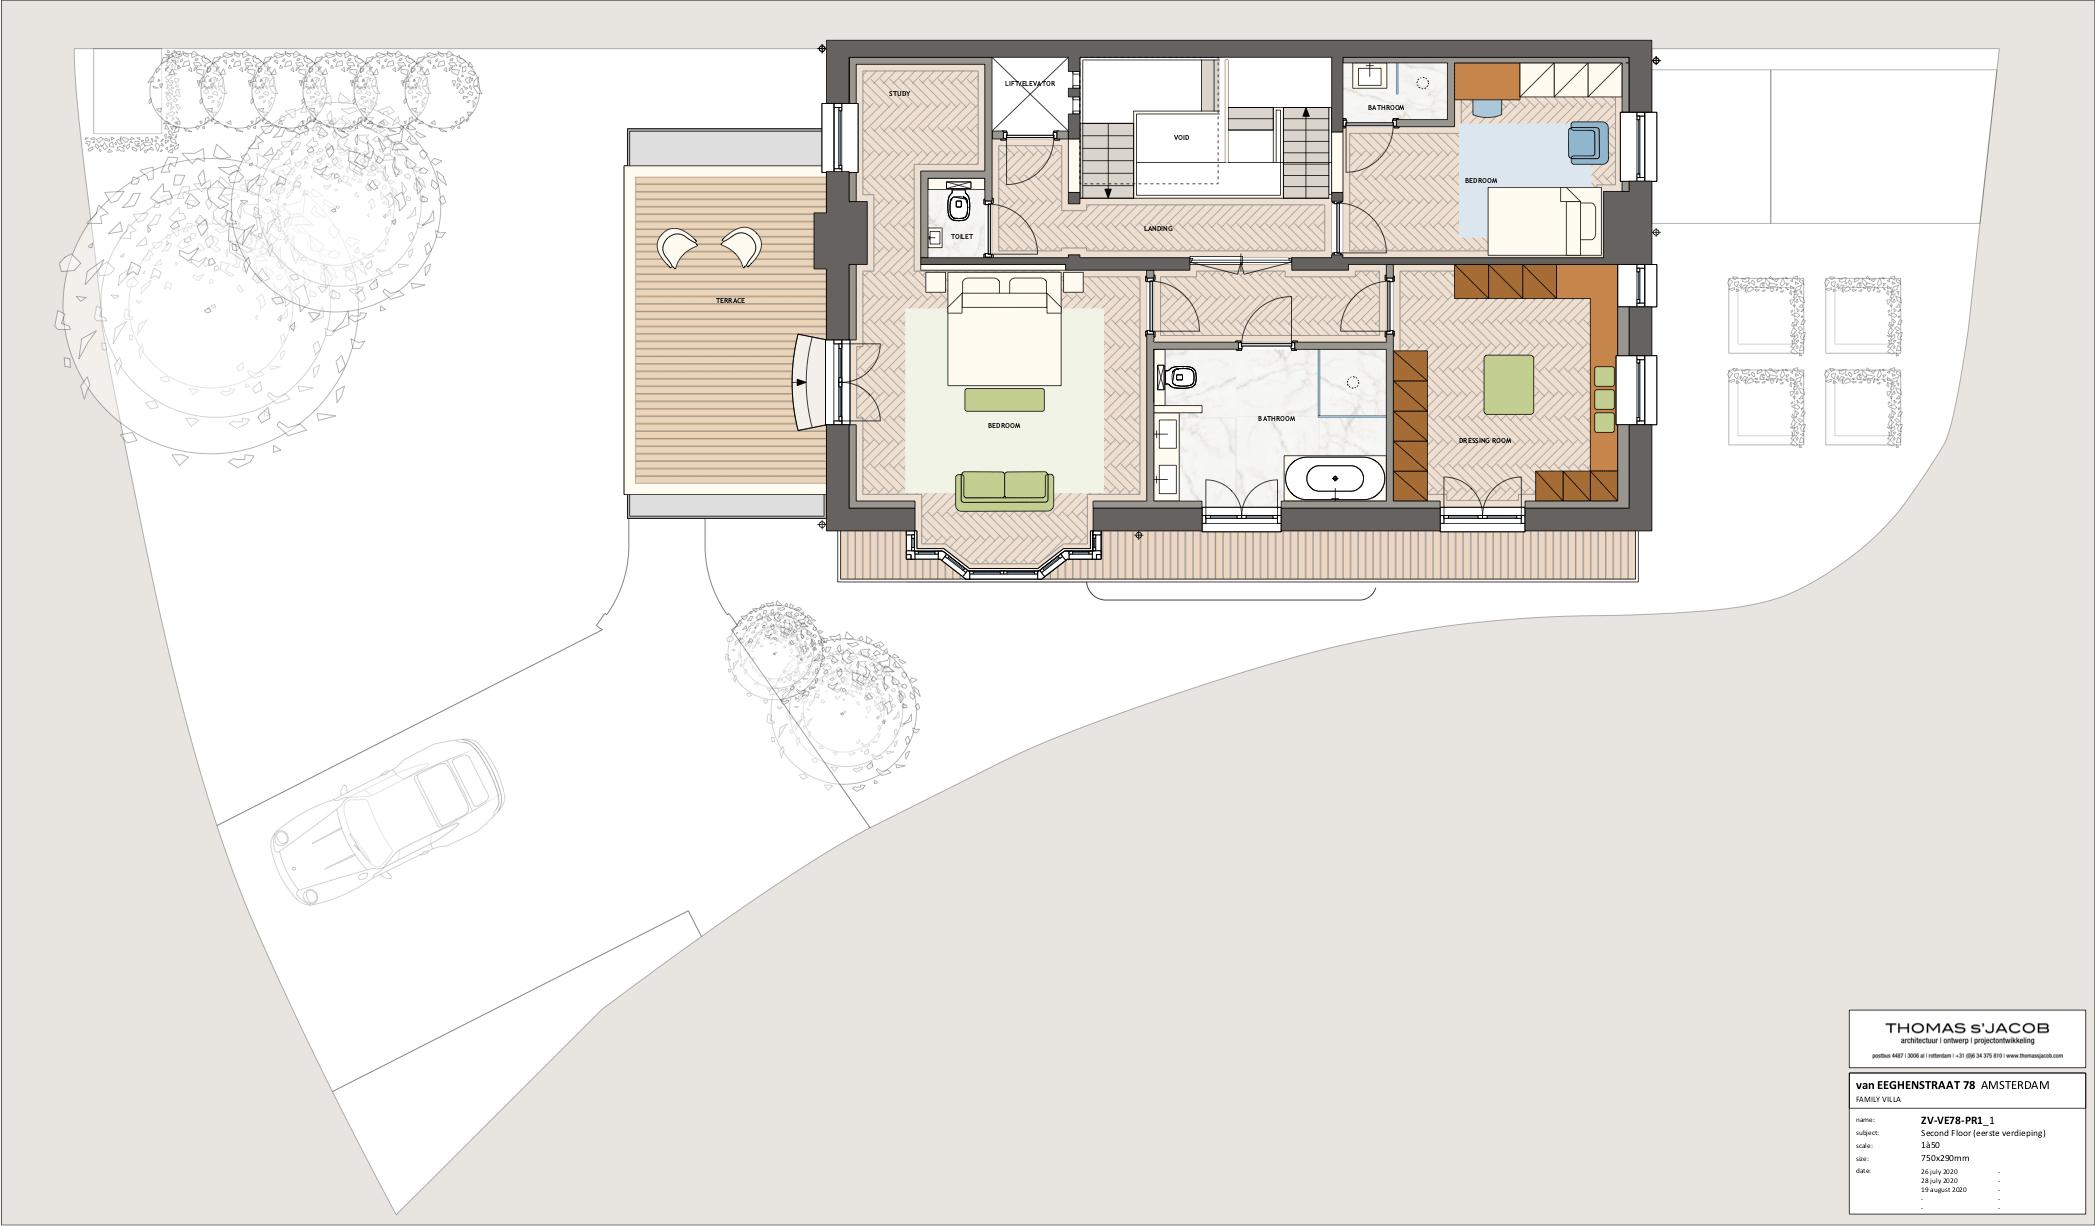 van eeghenstraat 78, plattegrond eerste verdieping/second floor